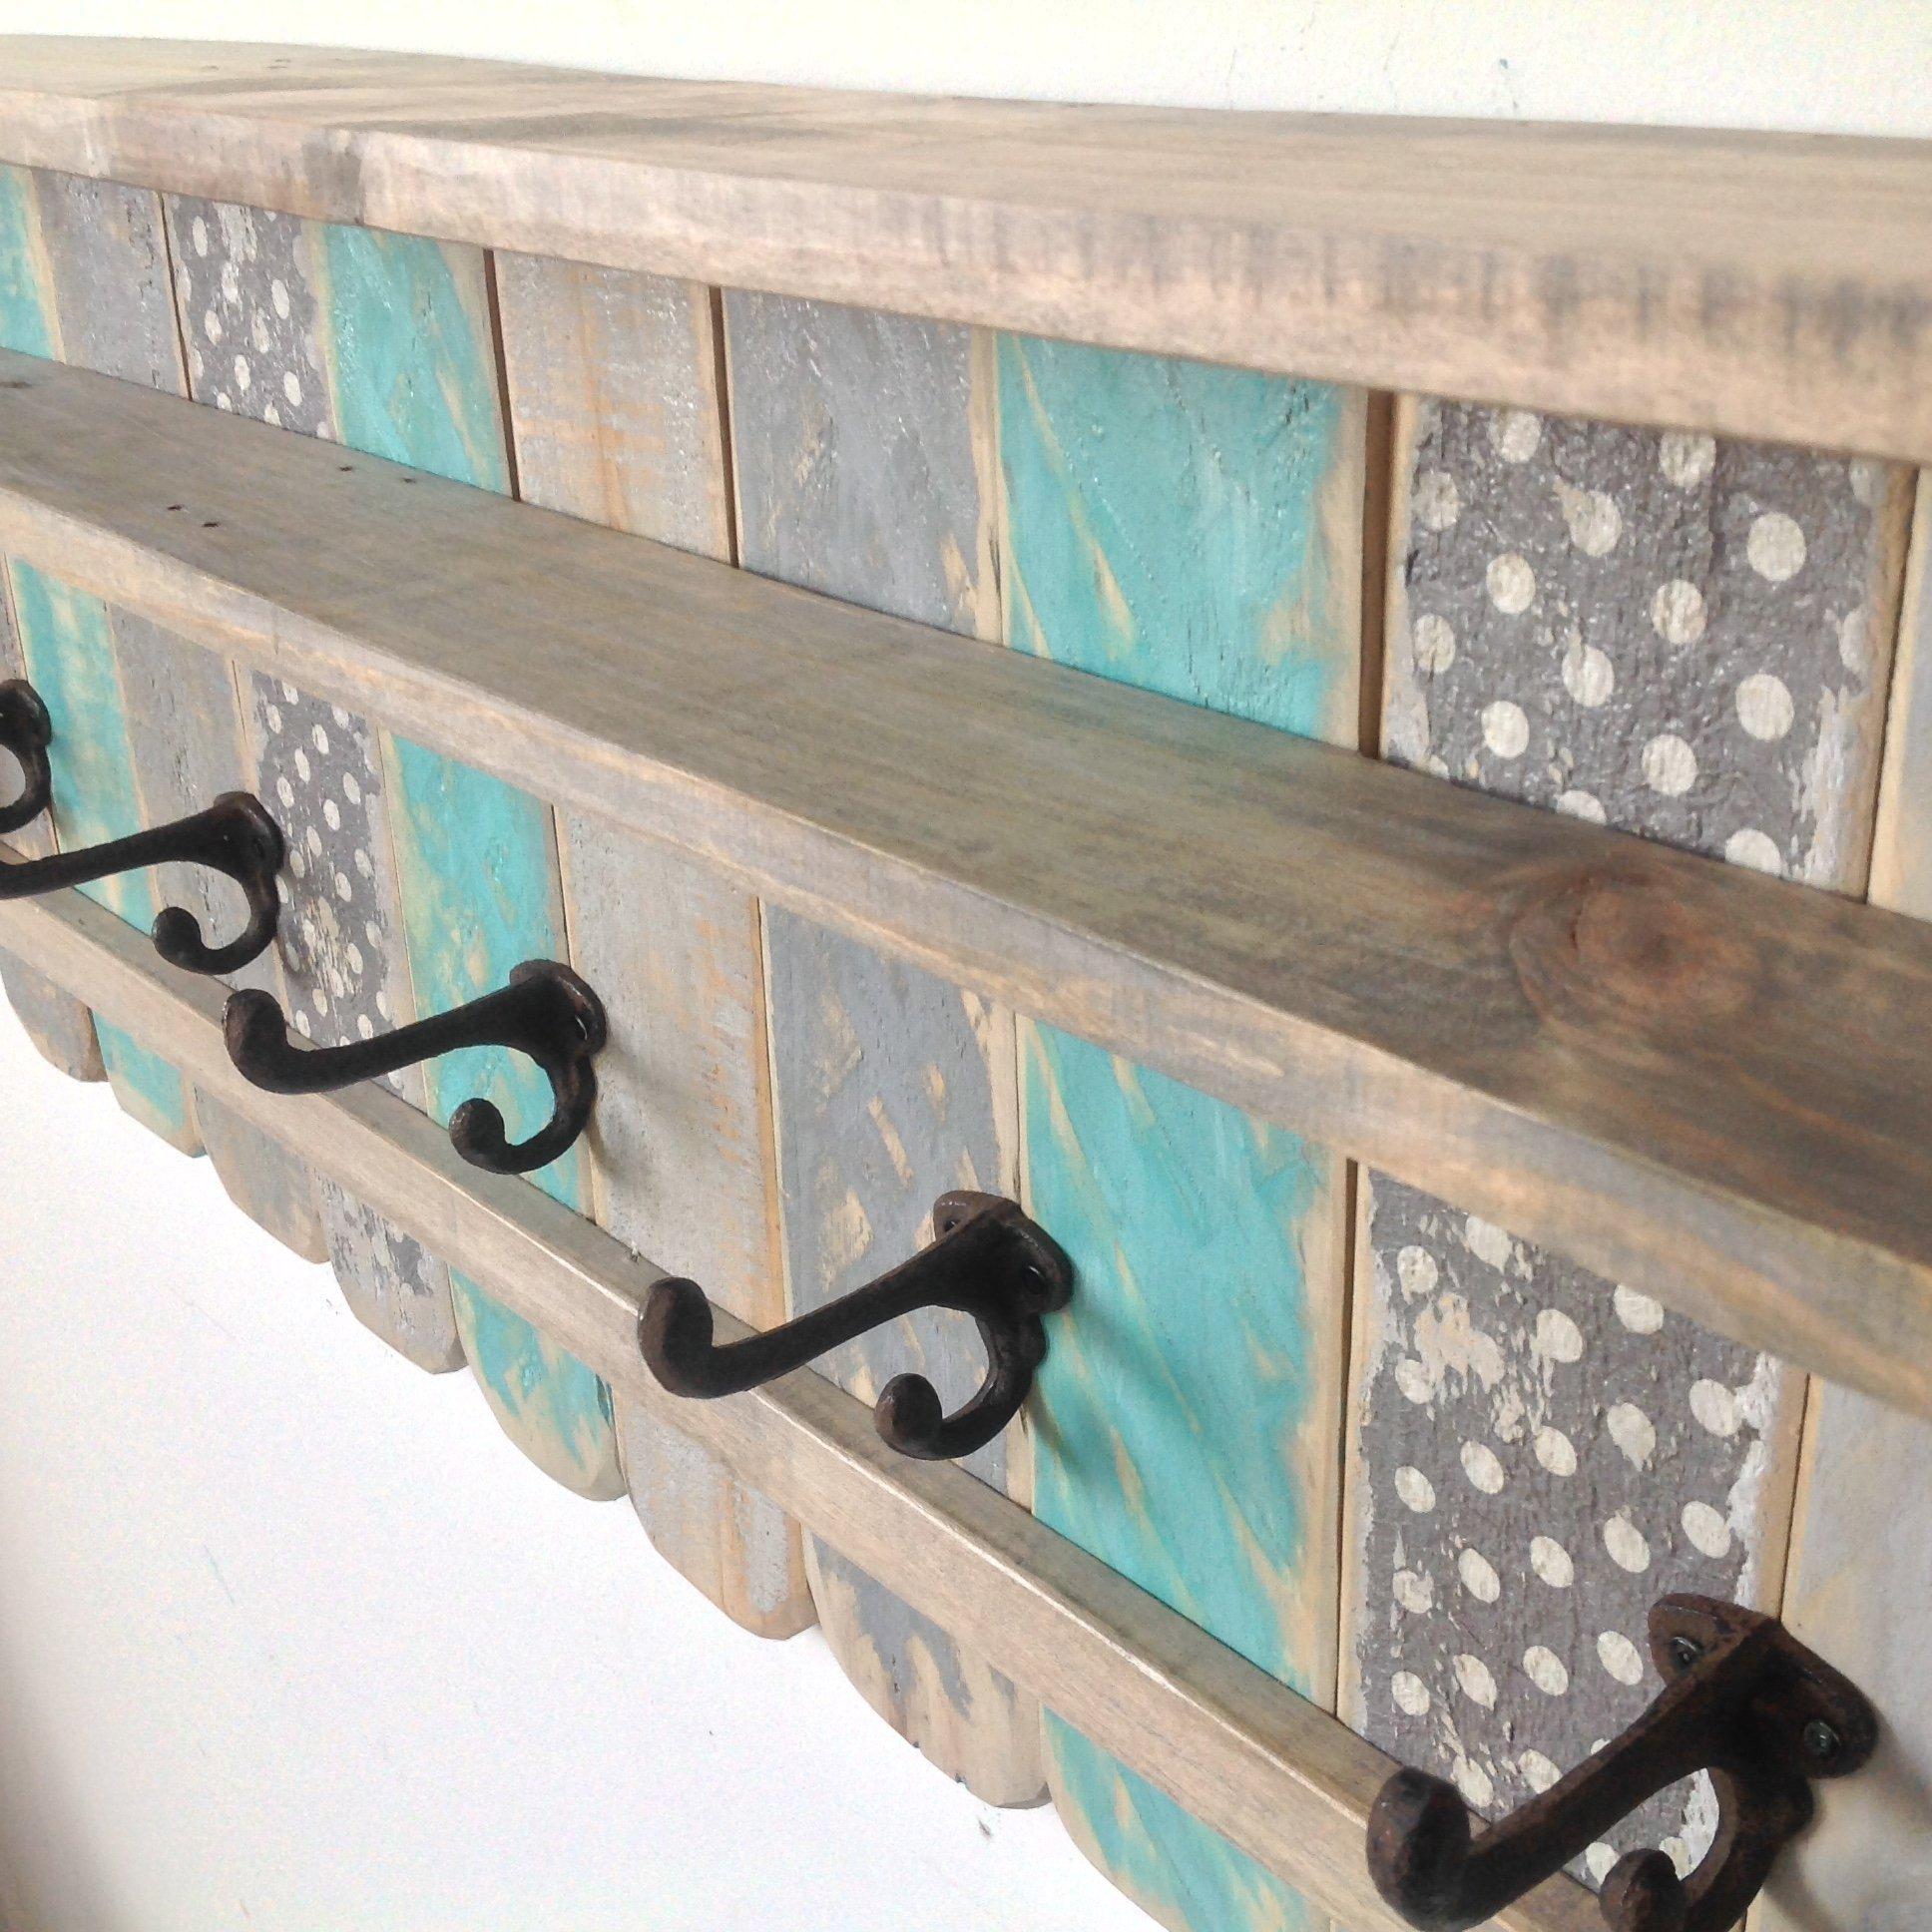 Entryway Wood Shelf / Rustic Pallet Coat Rack / Reclaimed Wood Shelves / Cast Iron Coat Hooks / Bohemian Decor / Bathroom Towel Rack